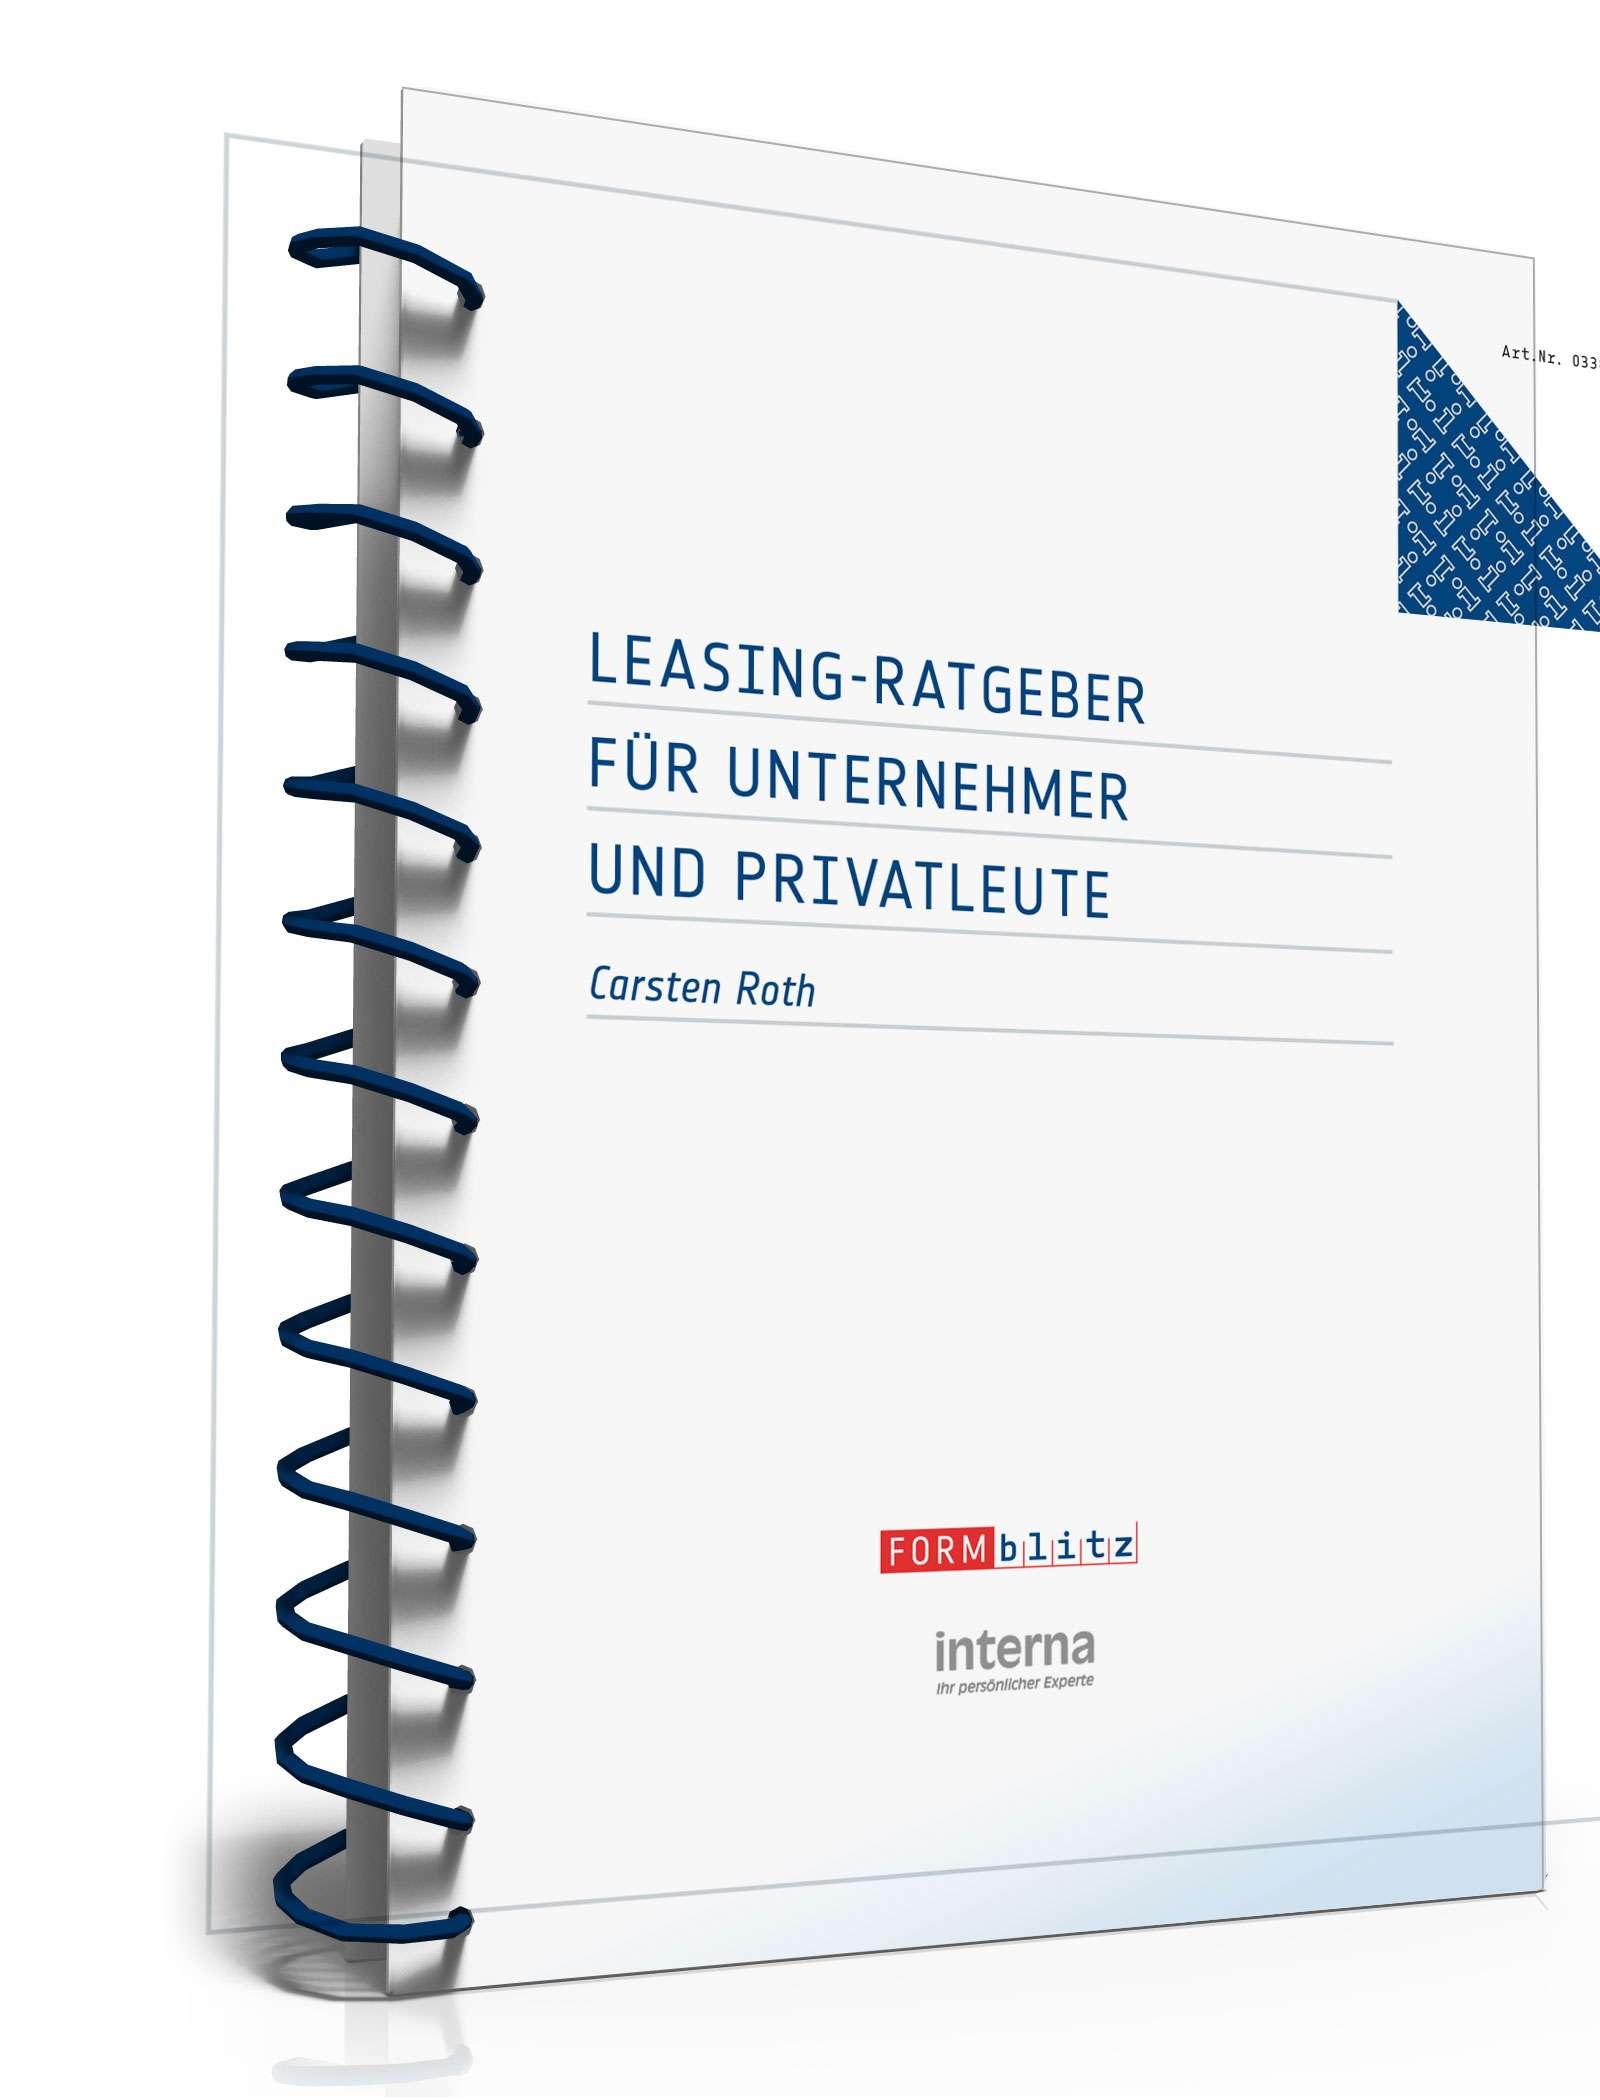 Groß Auto Leasingvertrag Vorlage Bilder - Entry Level Resume ...